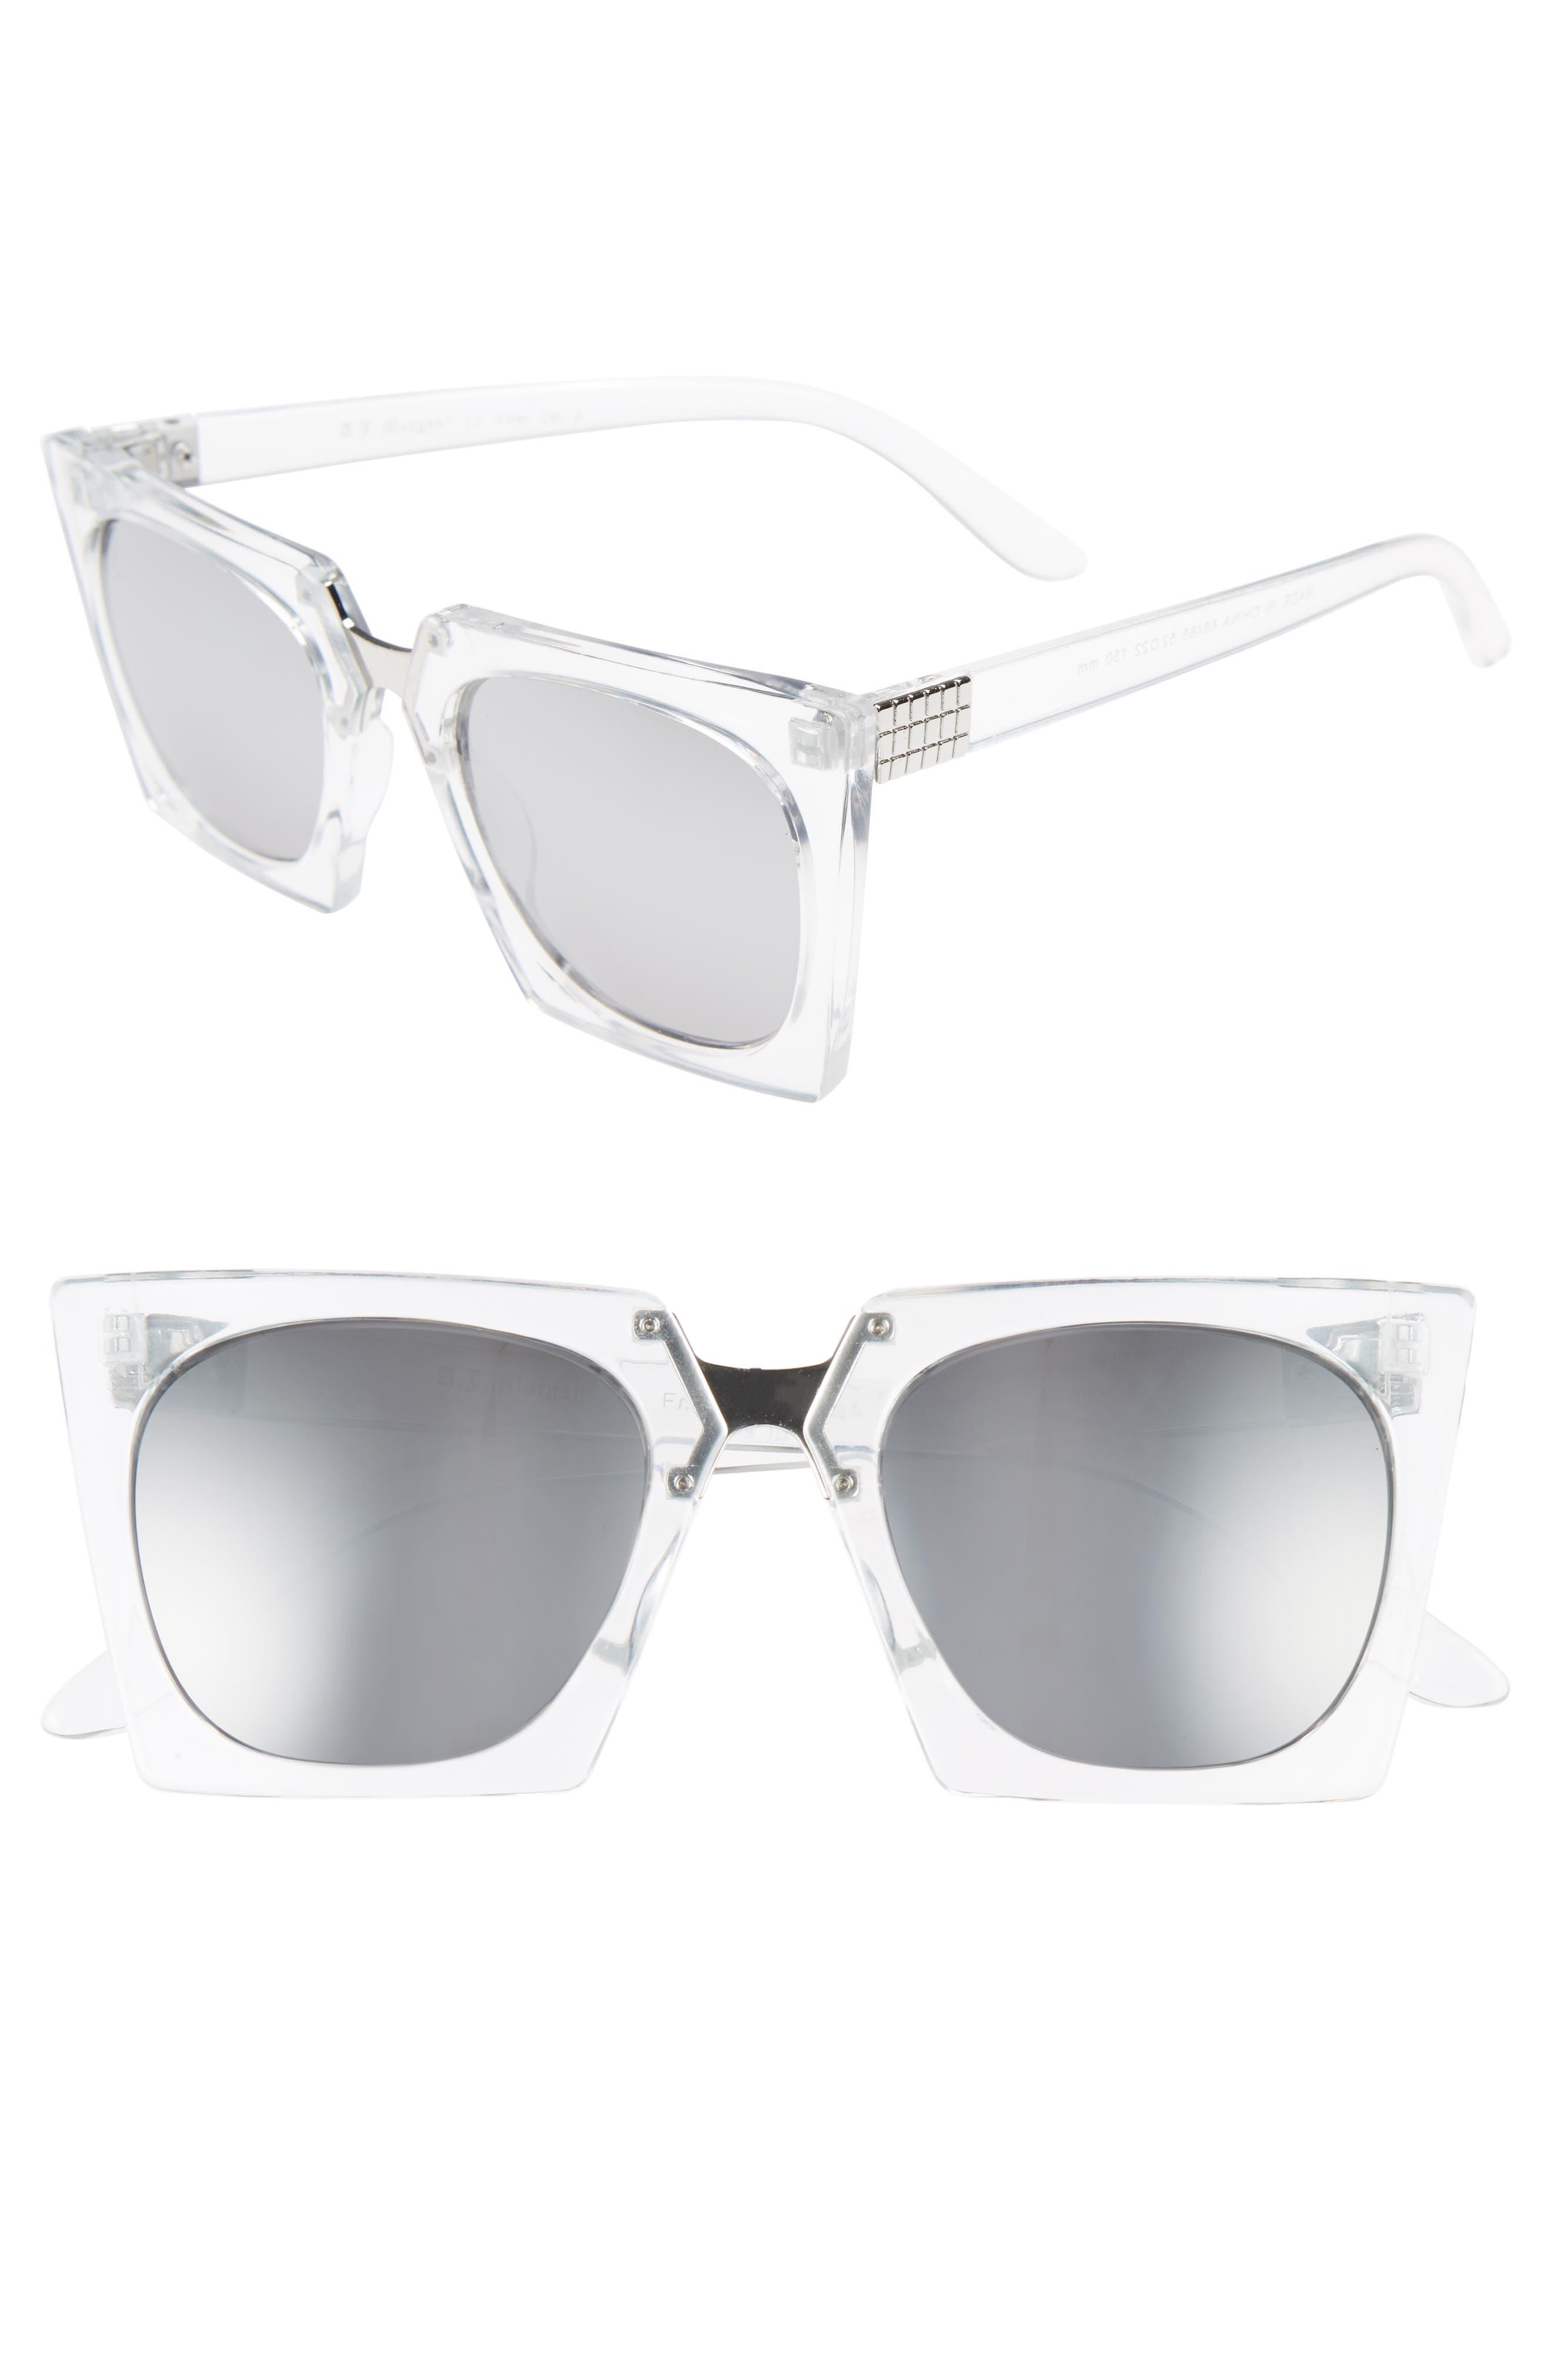 Main Image - A.J. Morgan Cropduster 52mm Sunglasses